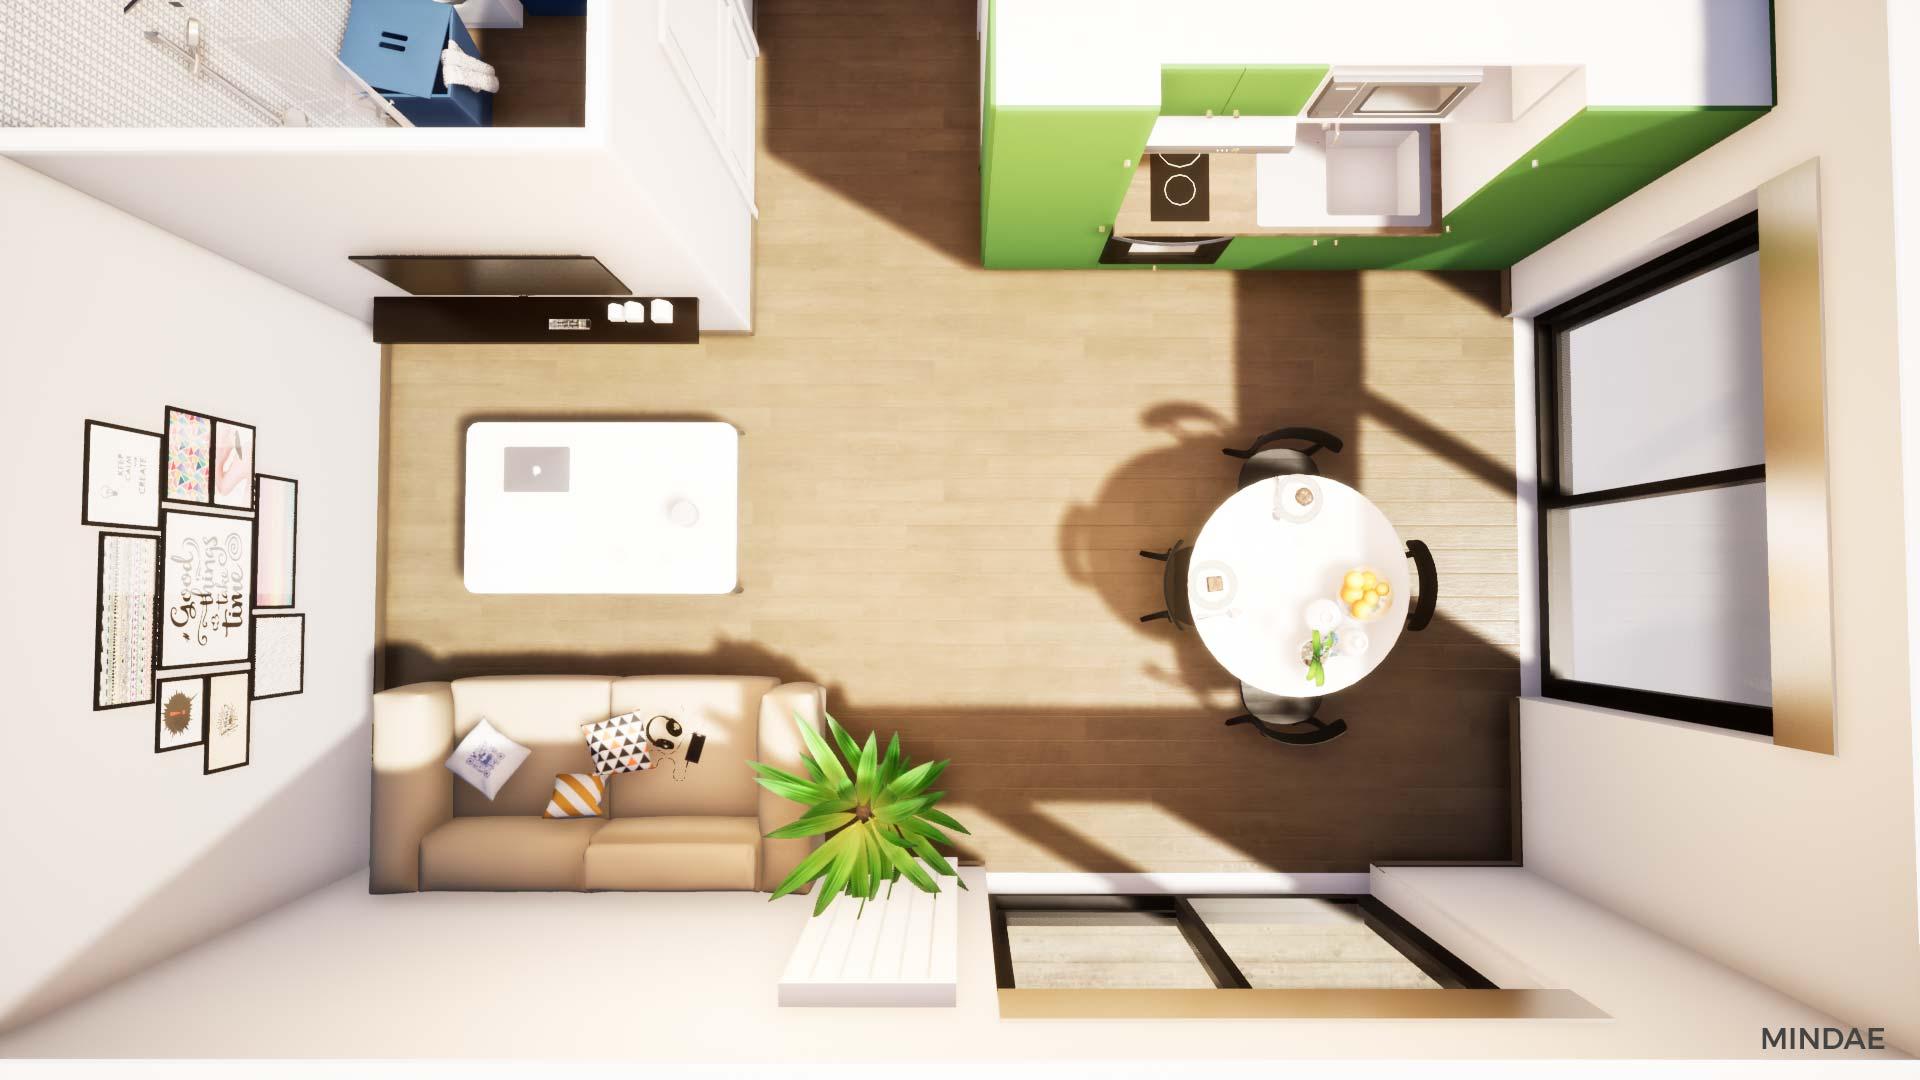 Mindae_3D_appartement_studio_étudiant_homestaging_immobilier_location-(1)